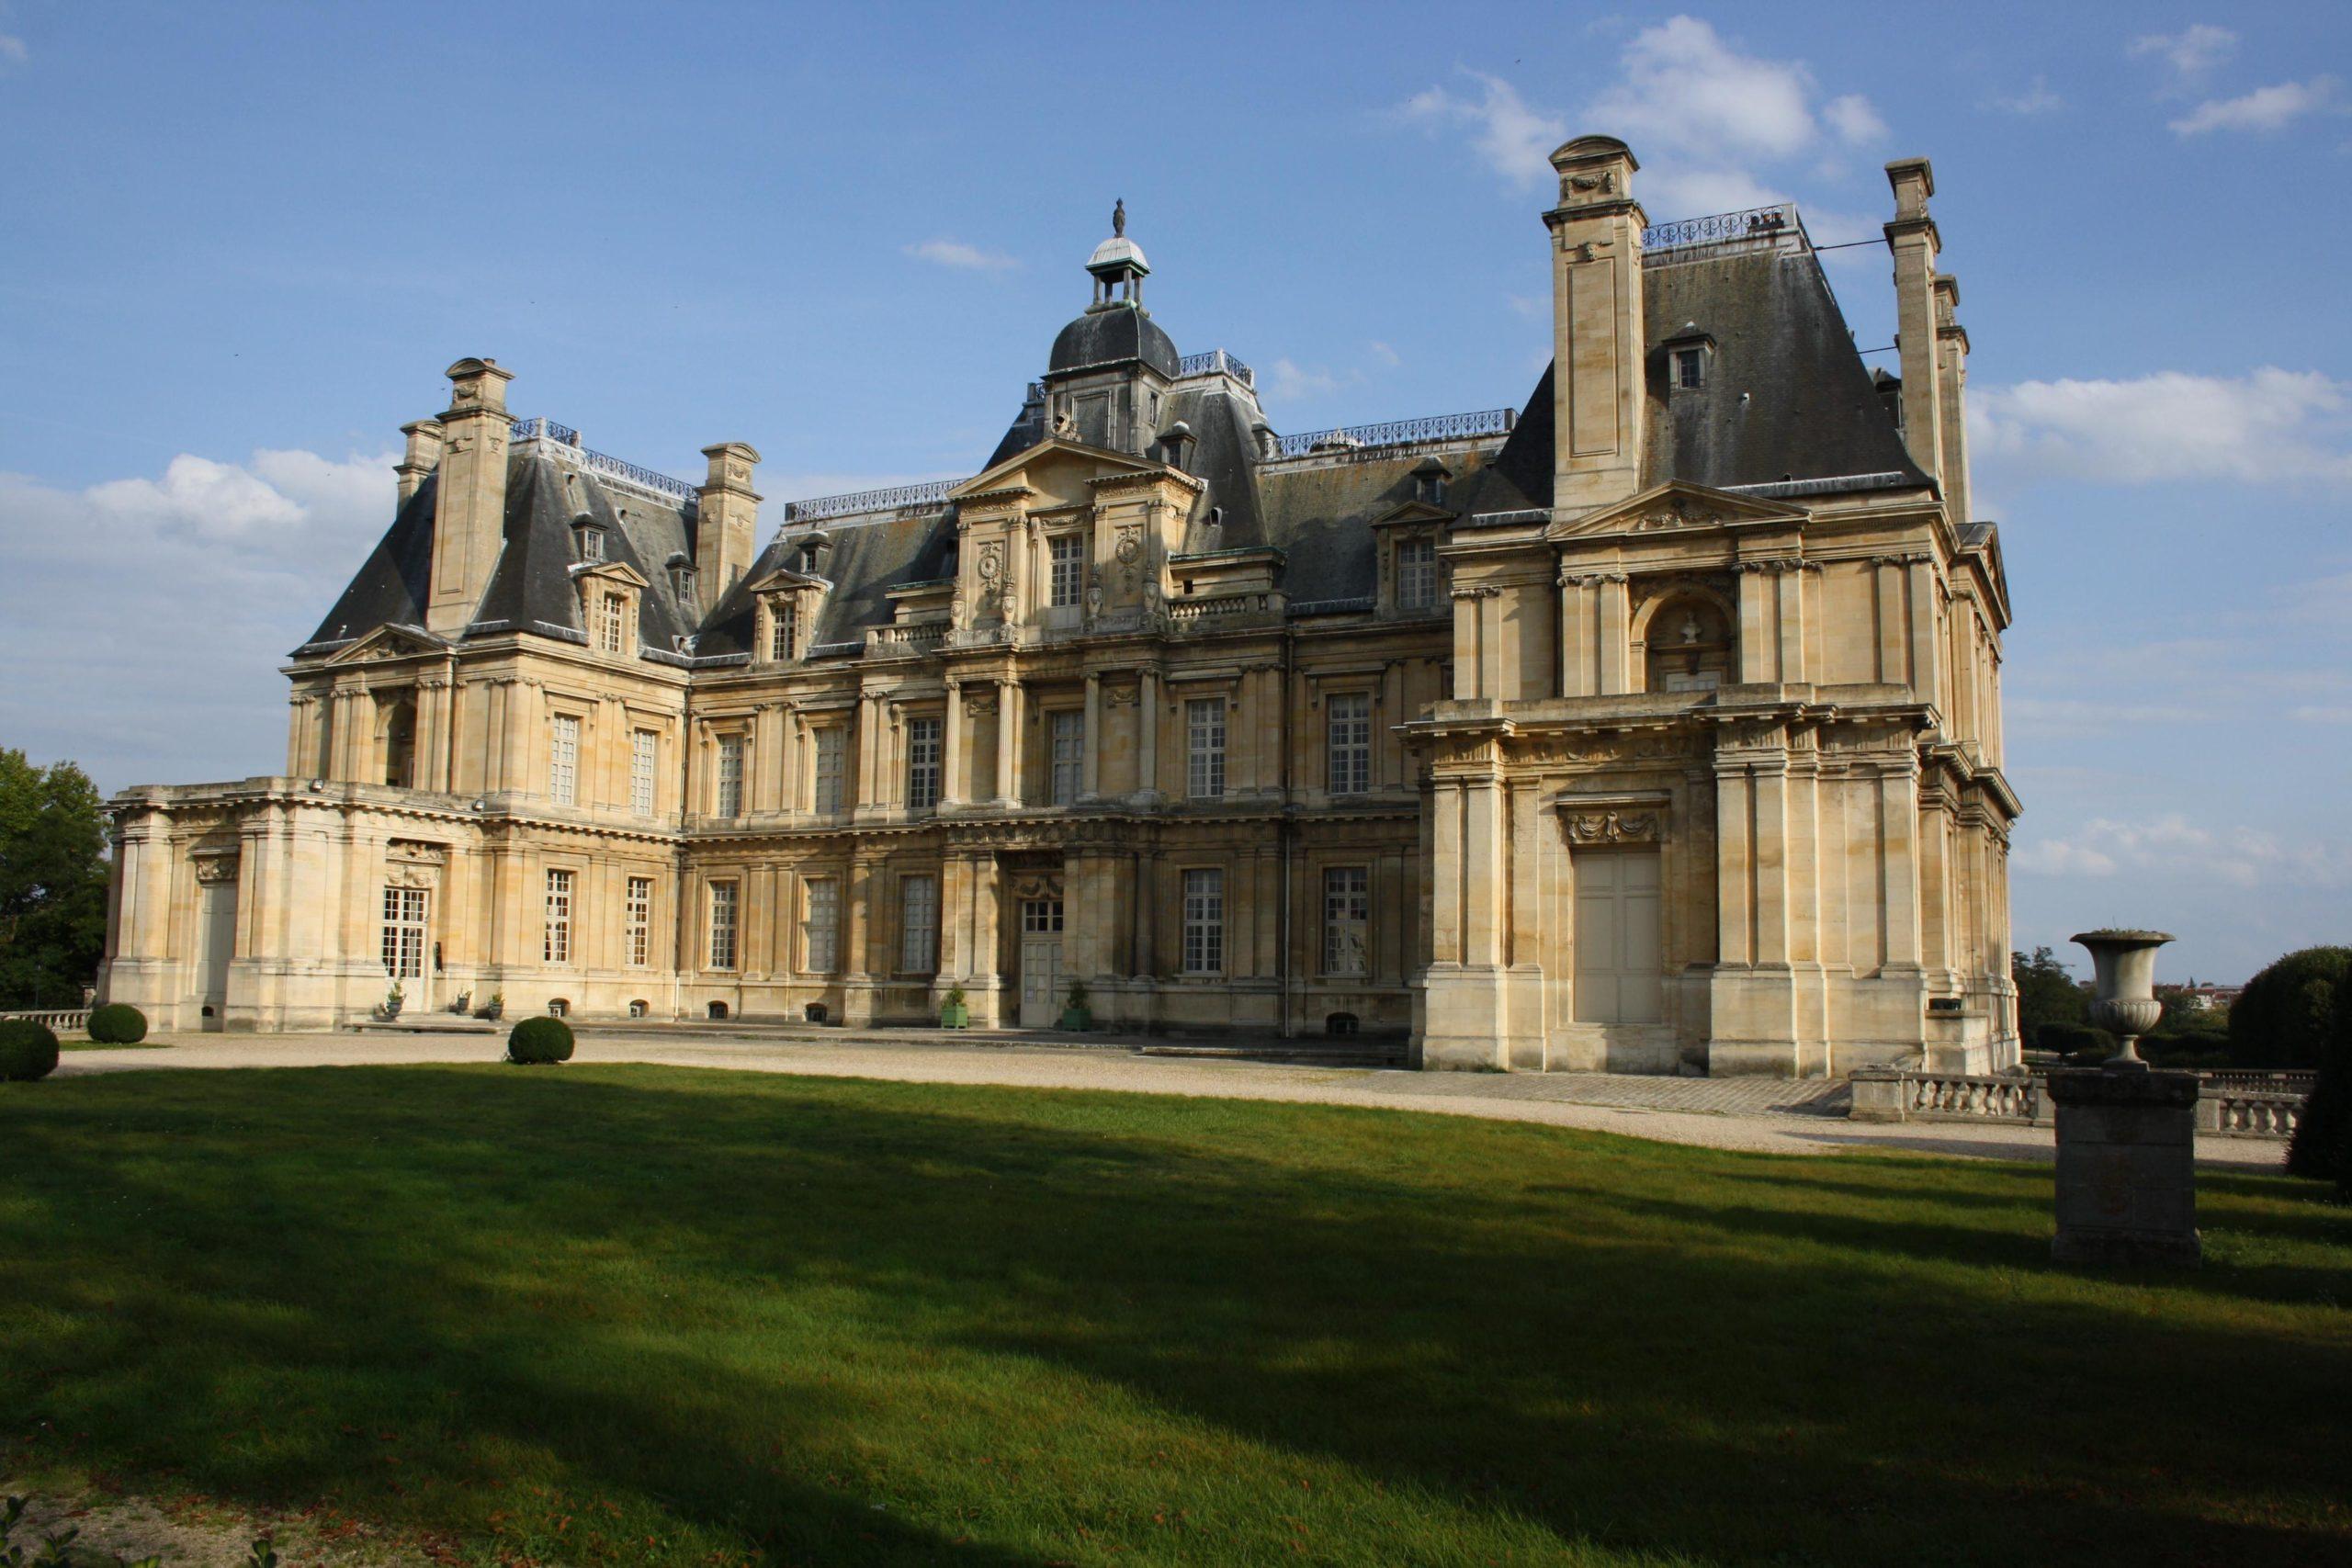 Plan Chateau Maisons Laffitte - Maison Plan